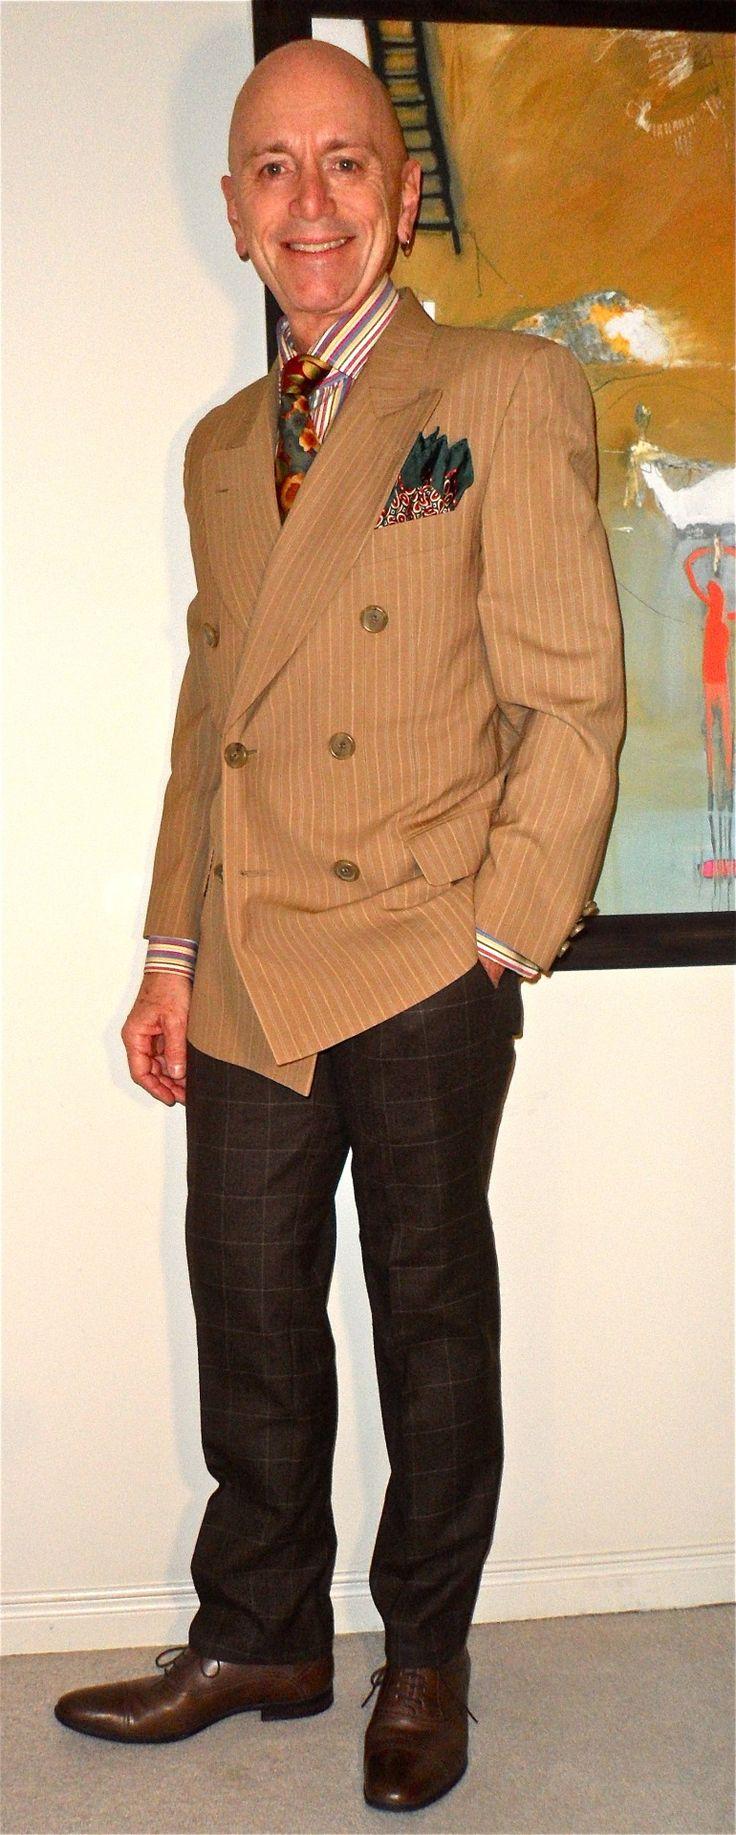 Dolce & Gabbana DB blazer, Paul Smith shirt, Veneziani tie, Black & Brown 1826 pants, Tiger of Sweden Shoes